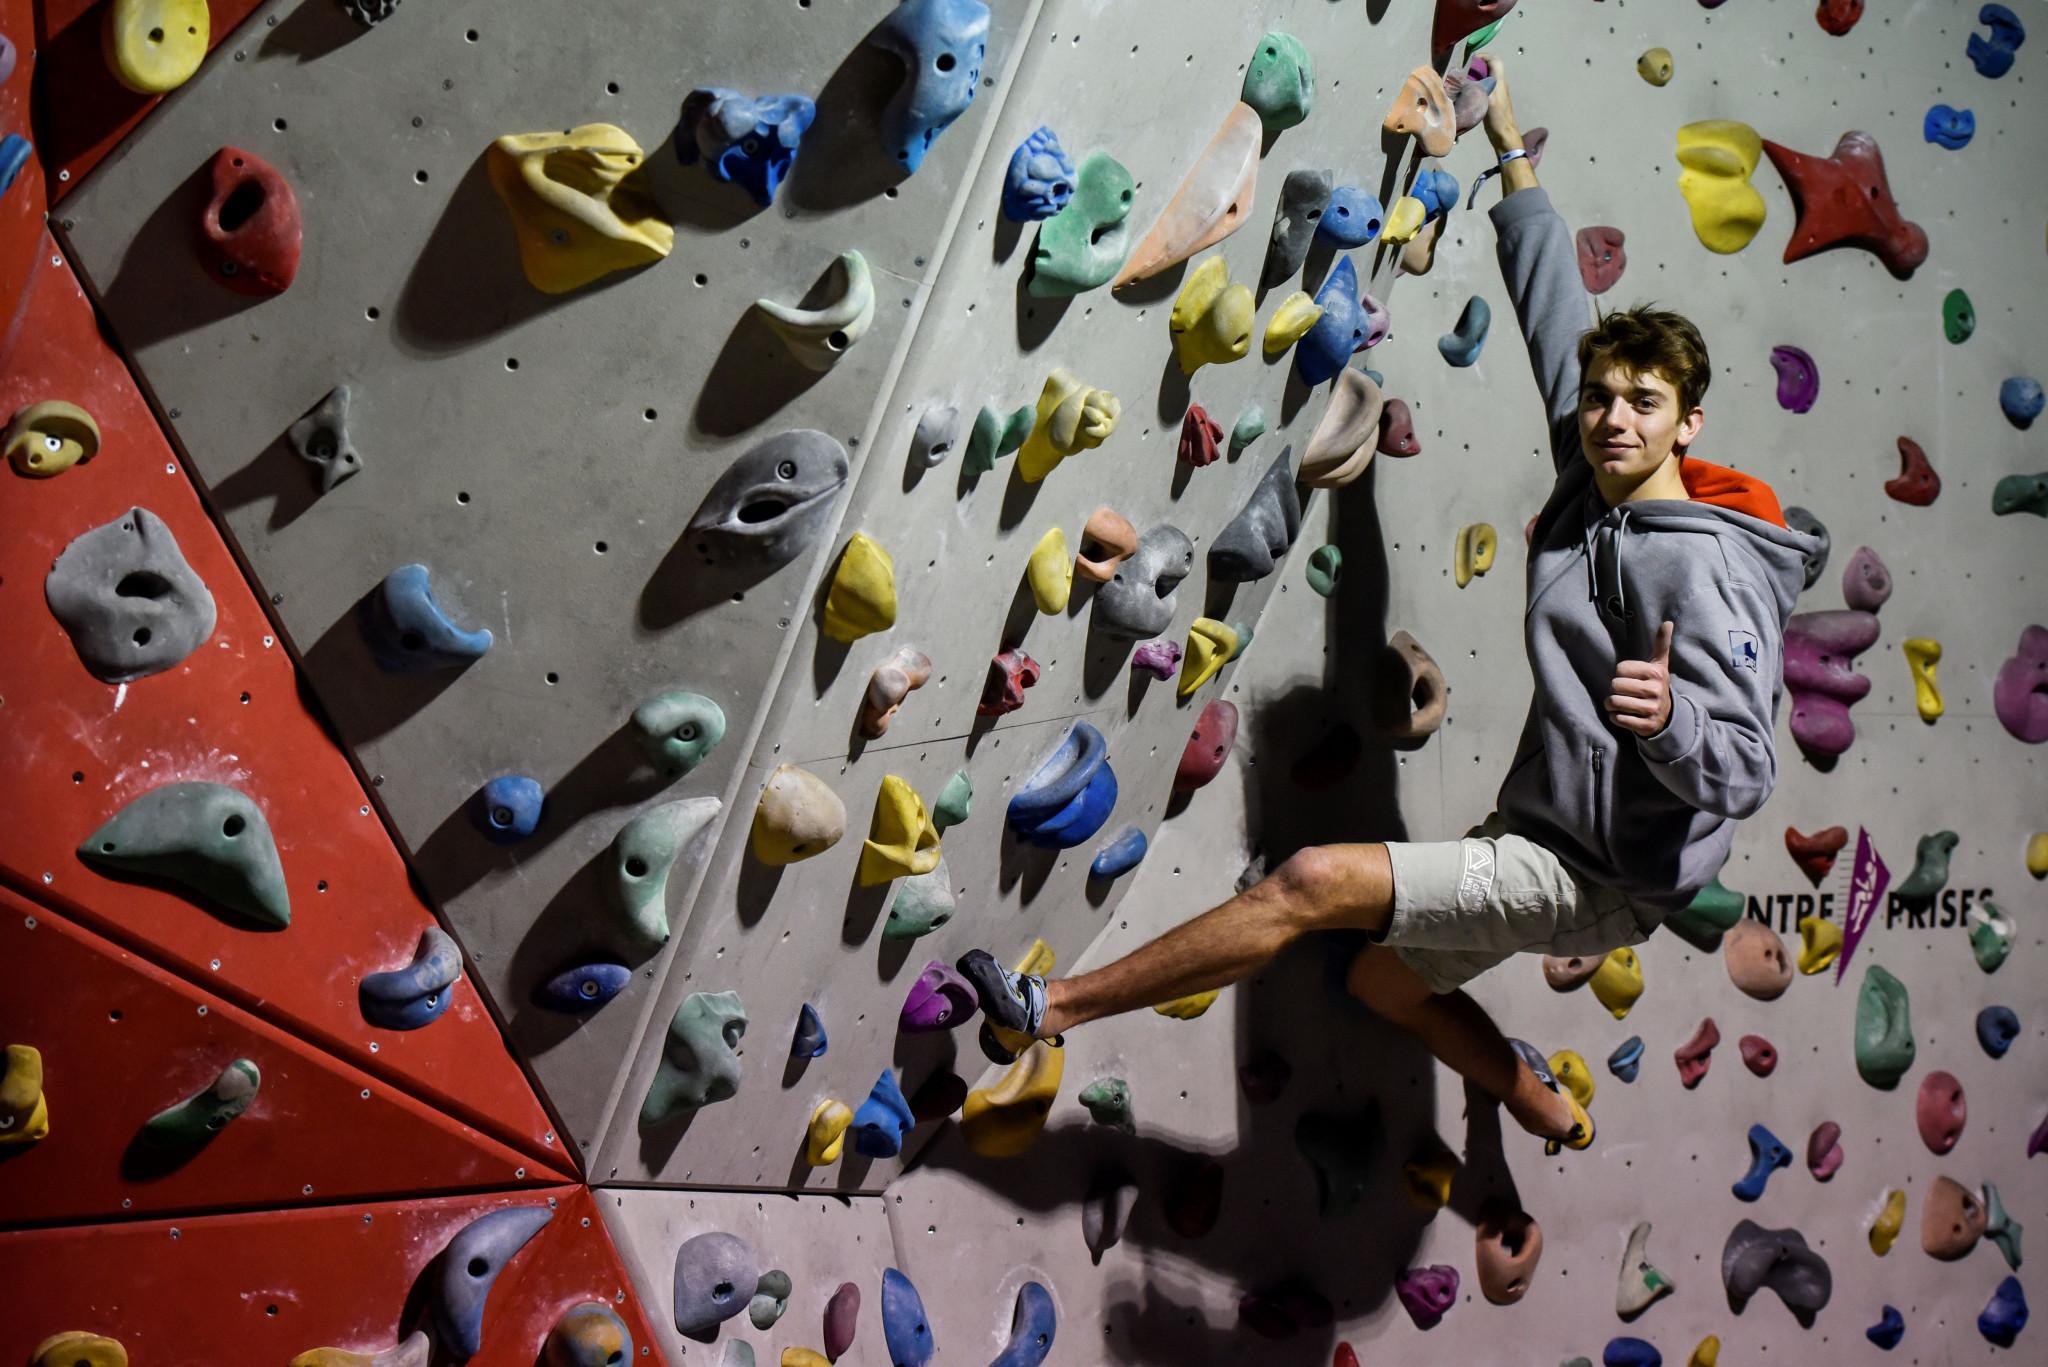 IFSC President hails sport climbing&20;s